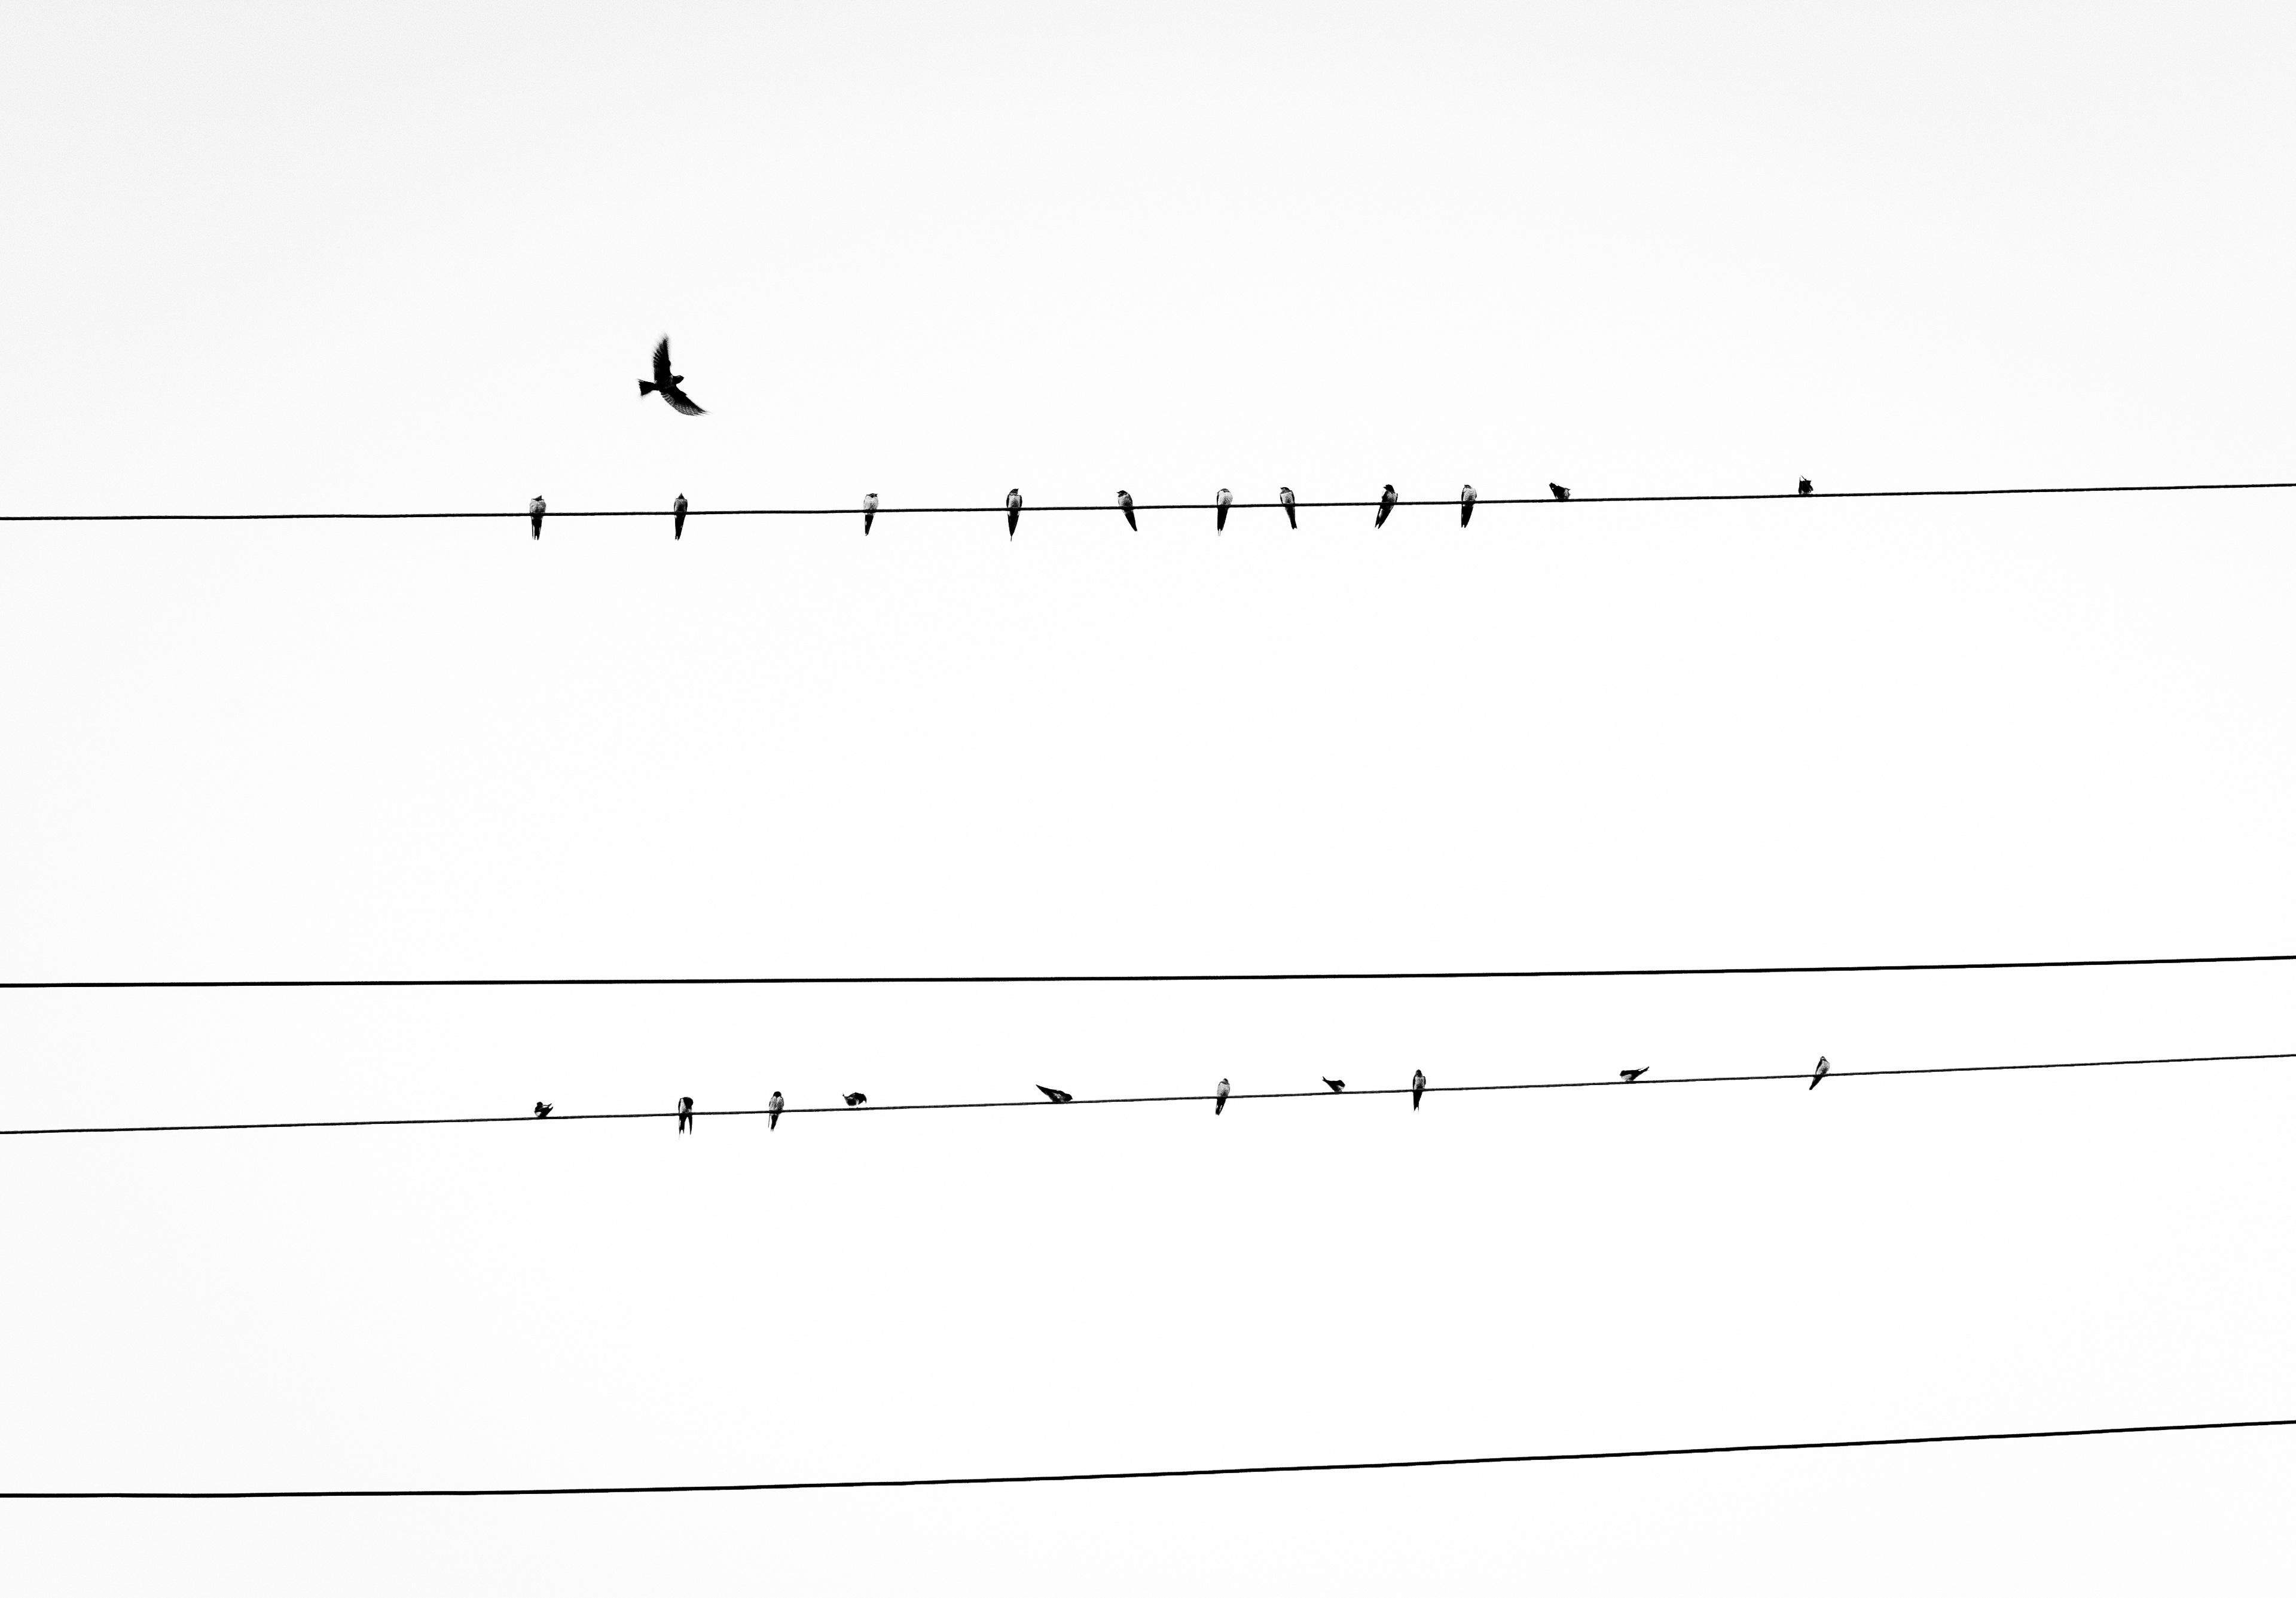 sky phone line wiring diagram free images nature  sky  technology  flock  wildlife  utility  sky  technology  flock  wildlife